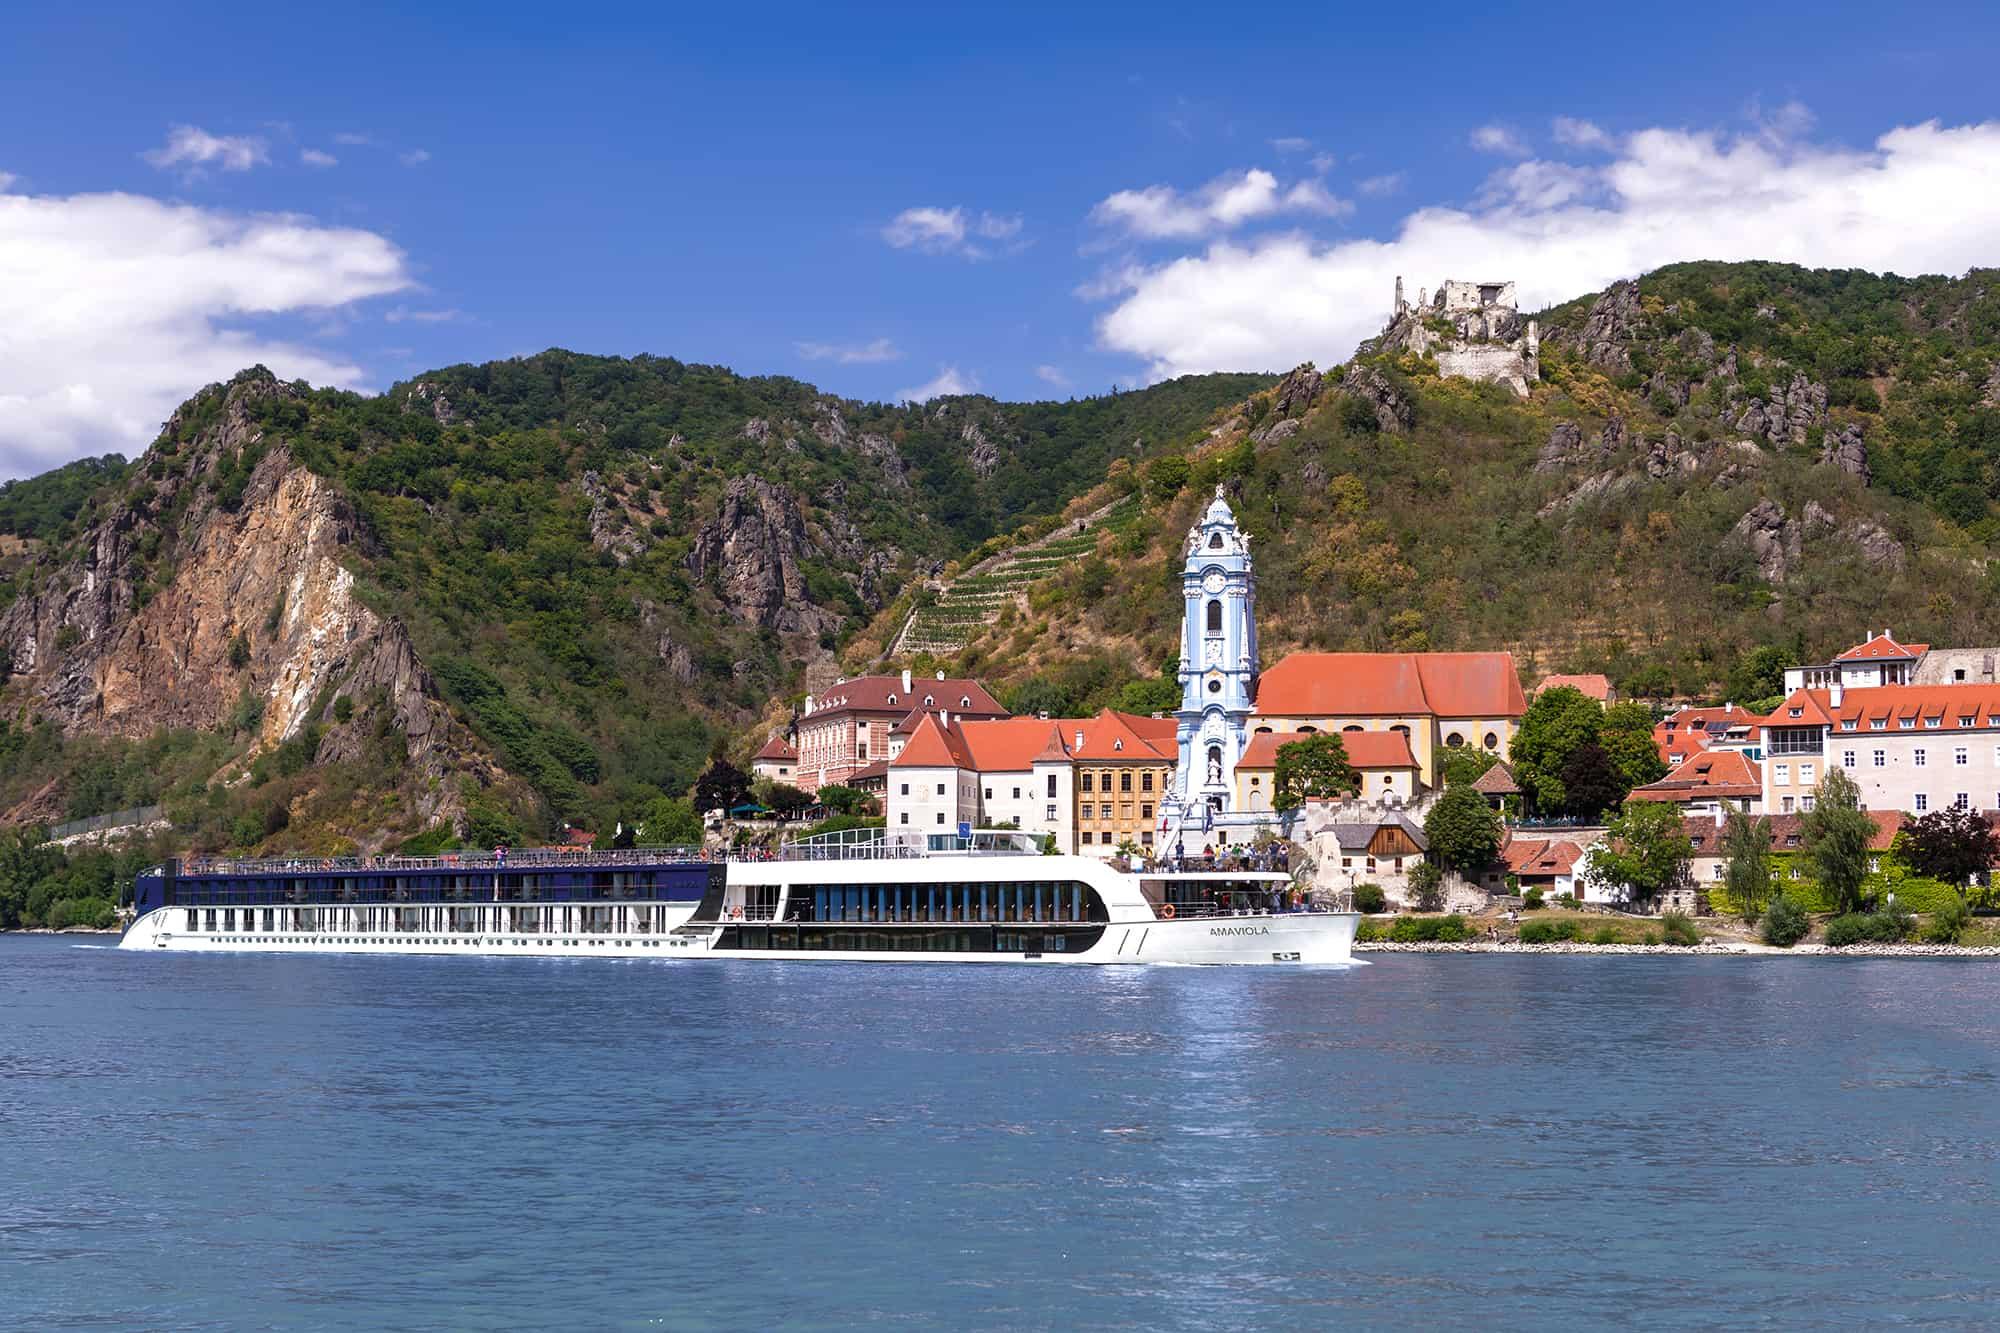 amaviola river ship europe